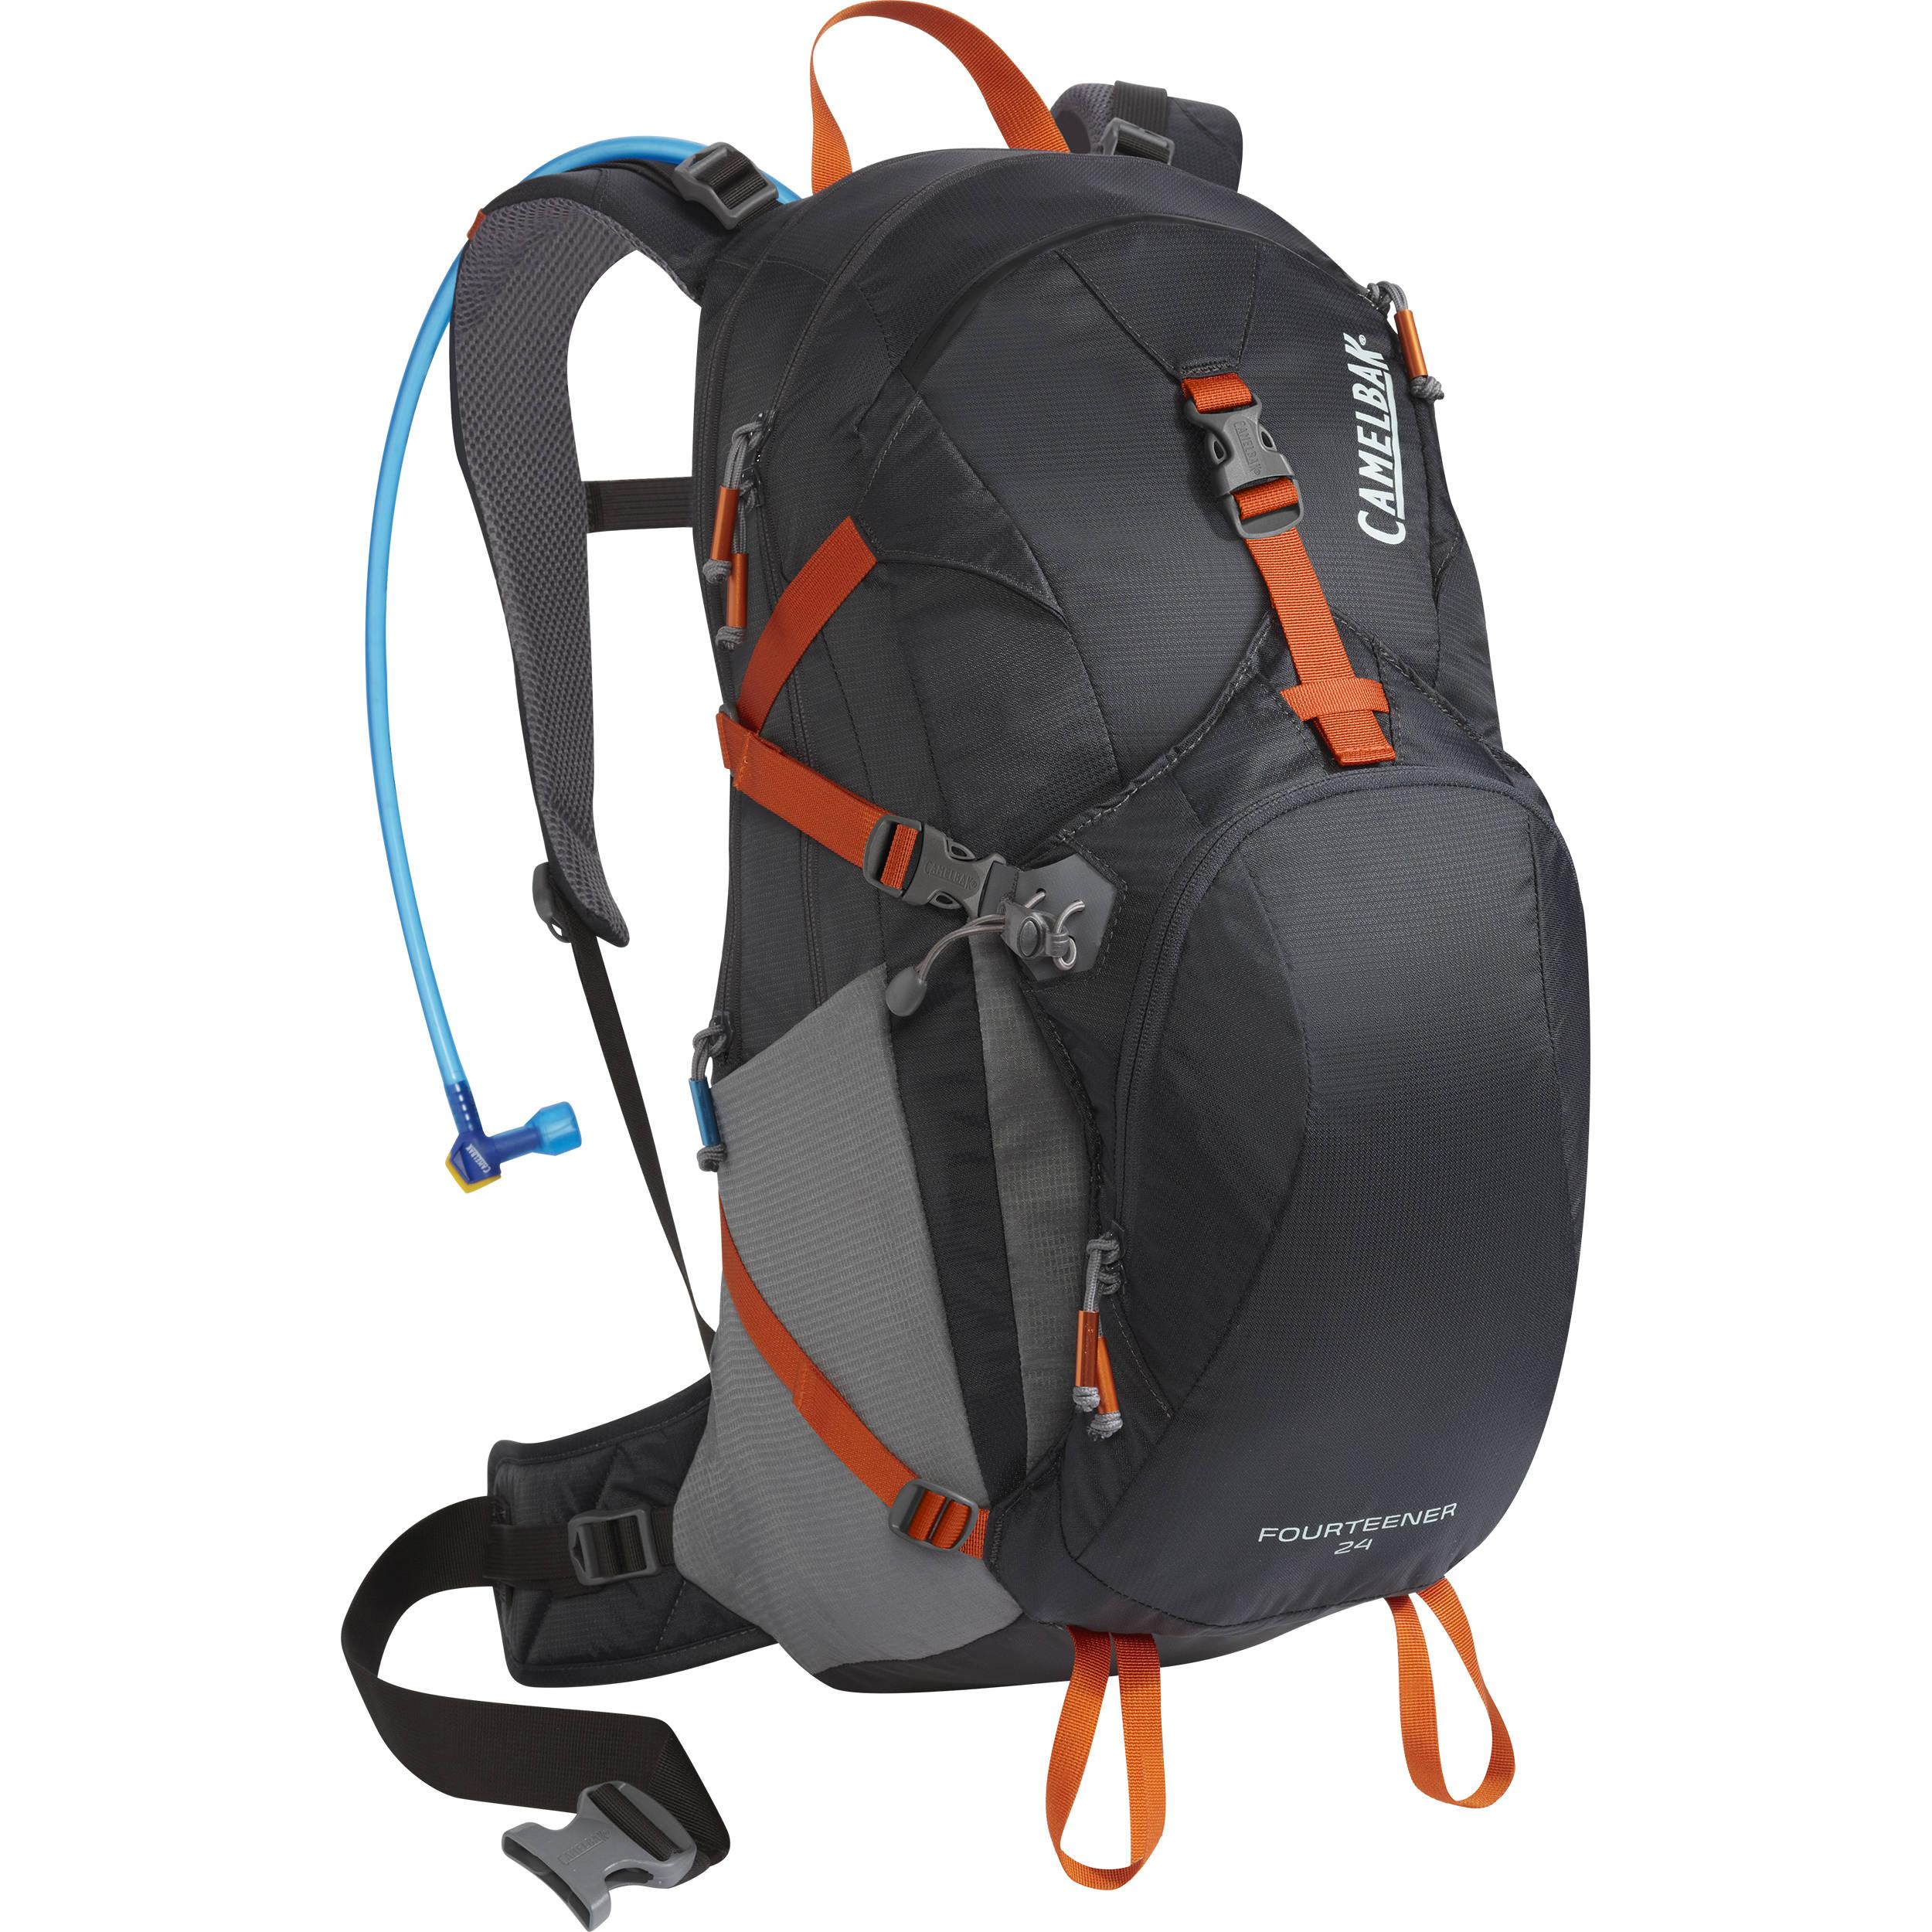 swiss gear water backpack Backpack Tools